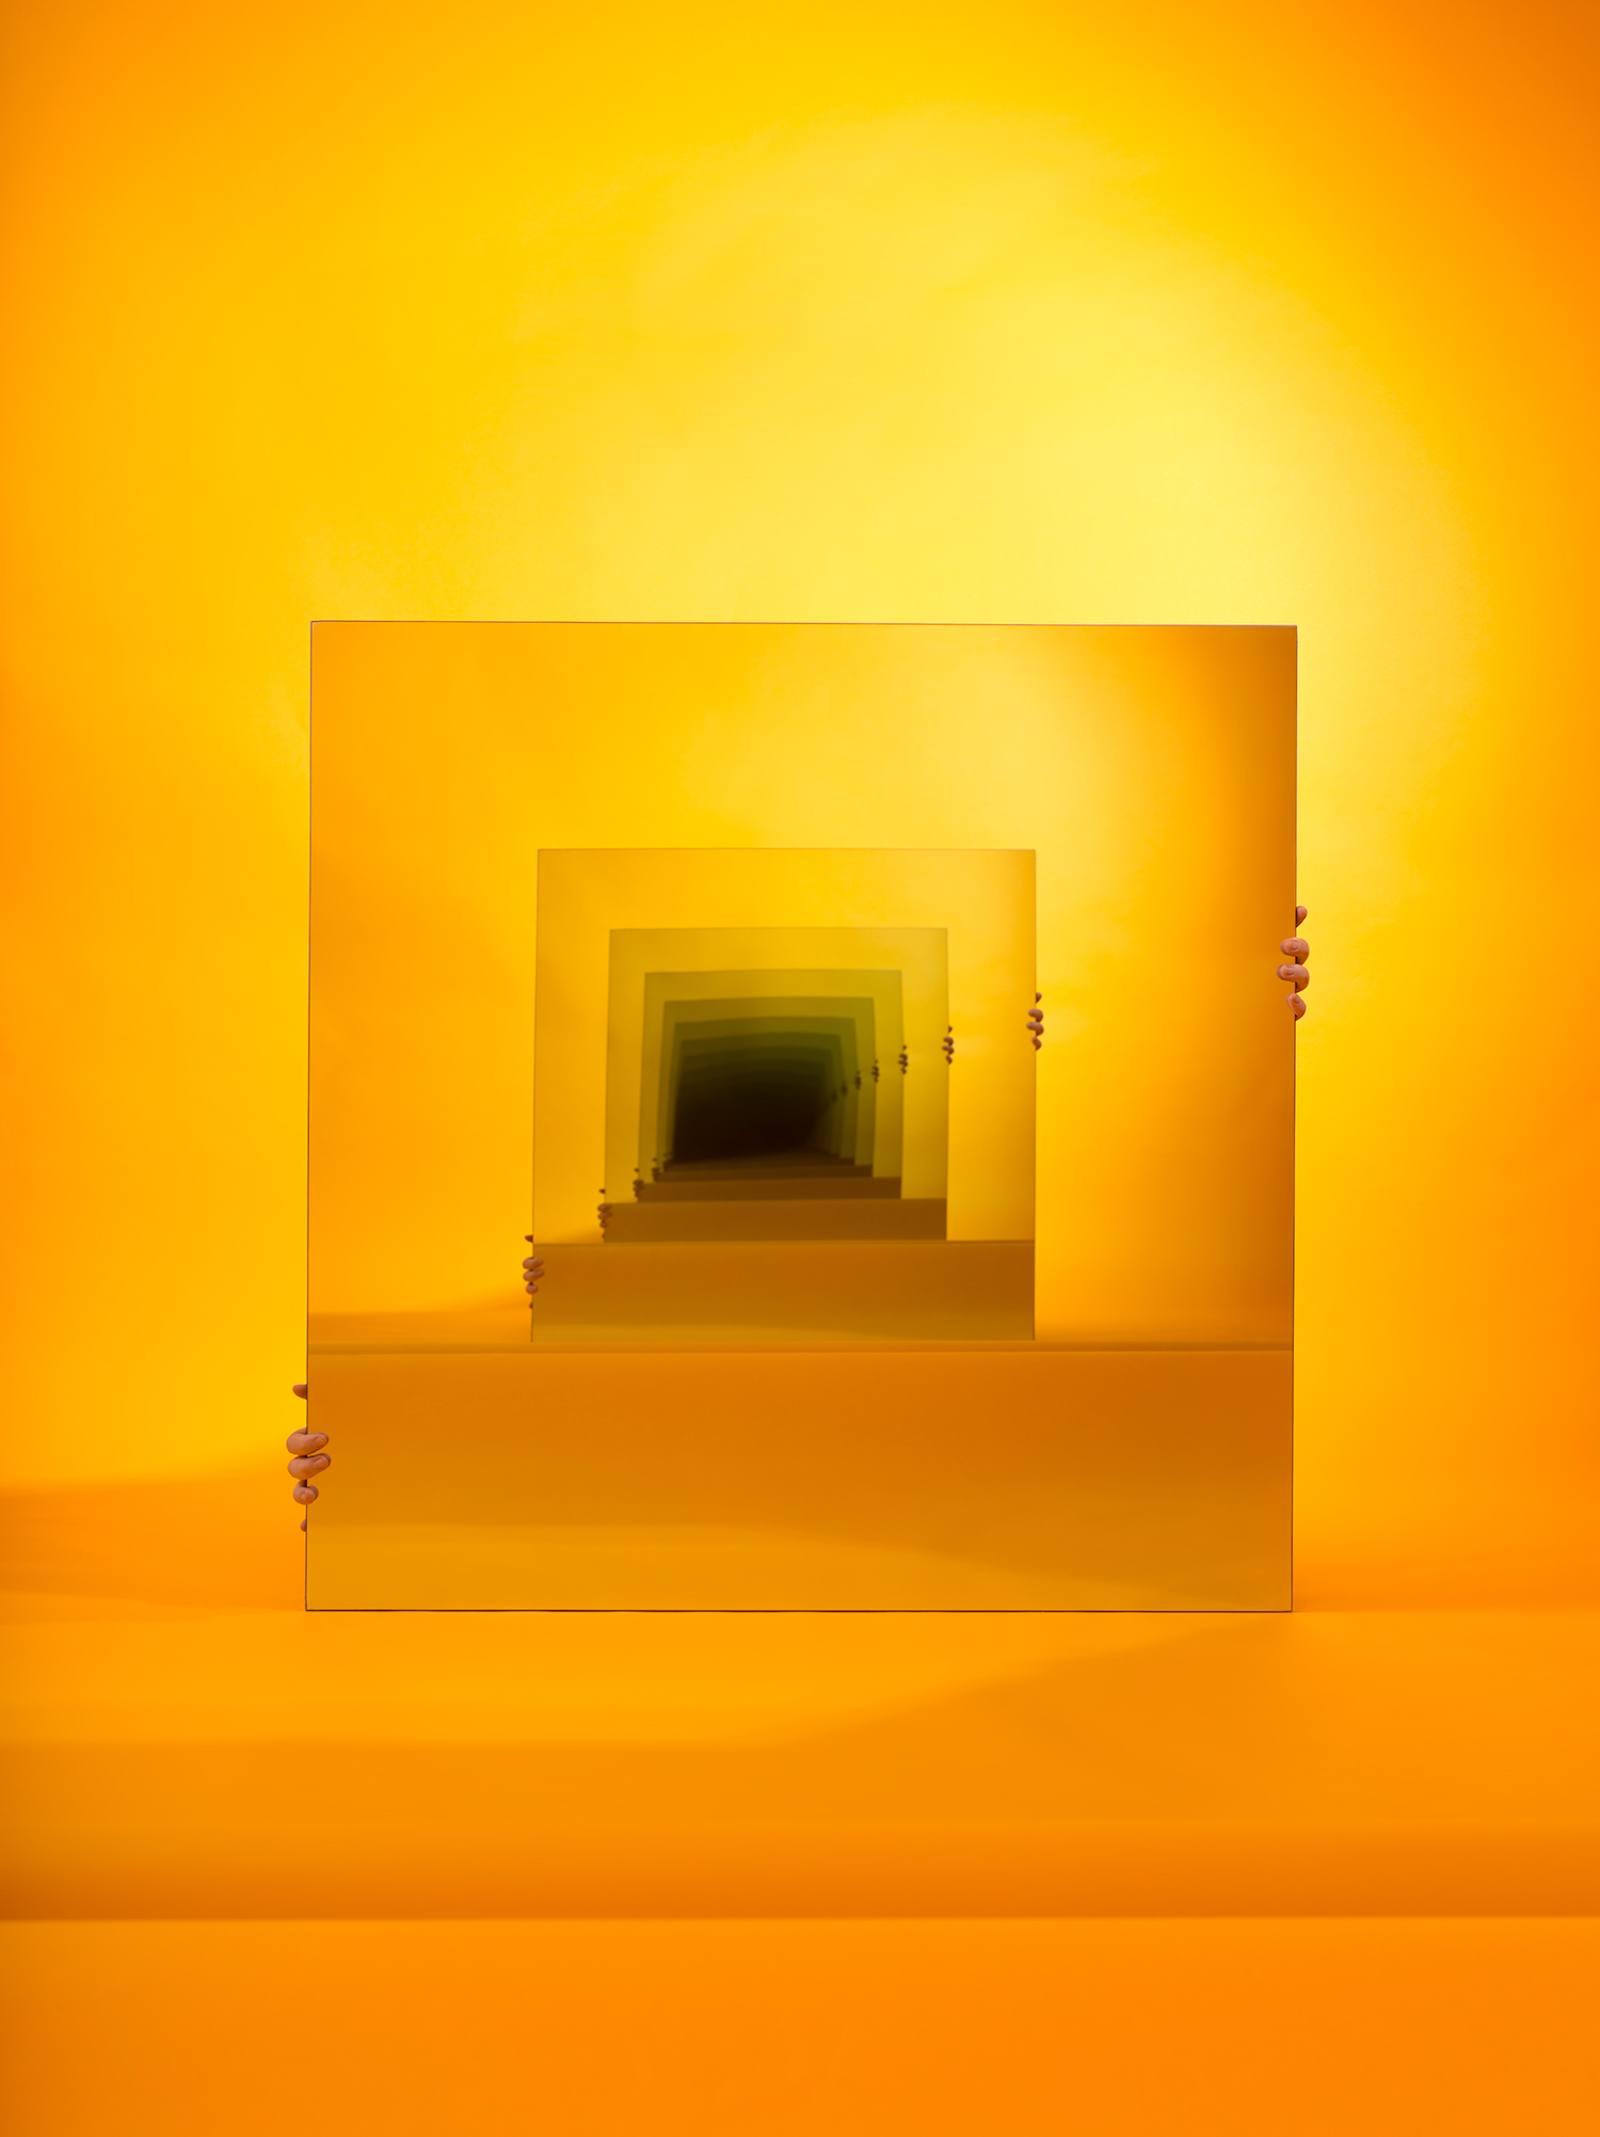 iGNANT-Art-Sarah-Meyohas-Speculations-011